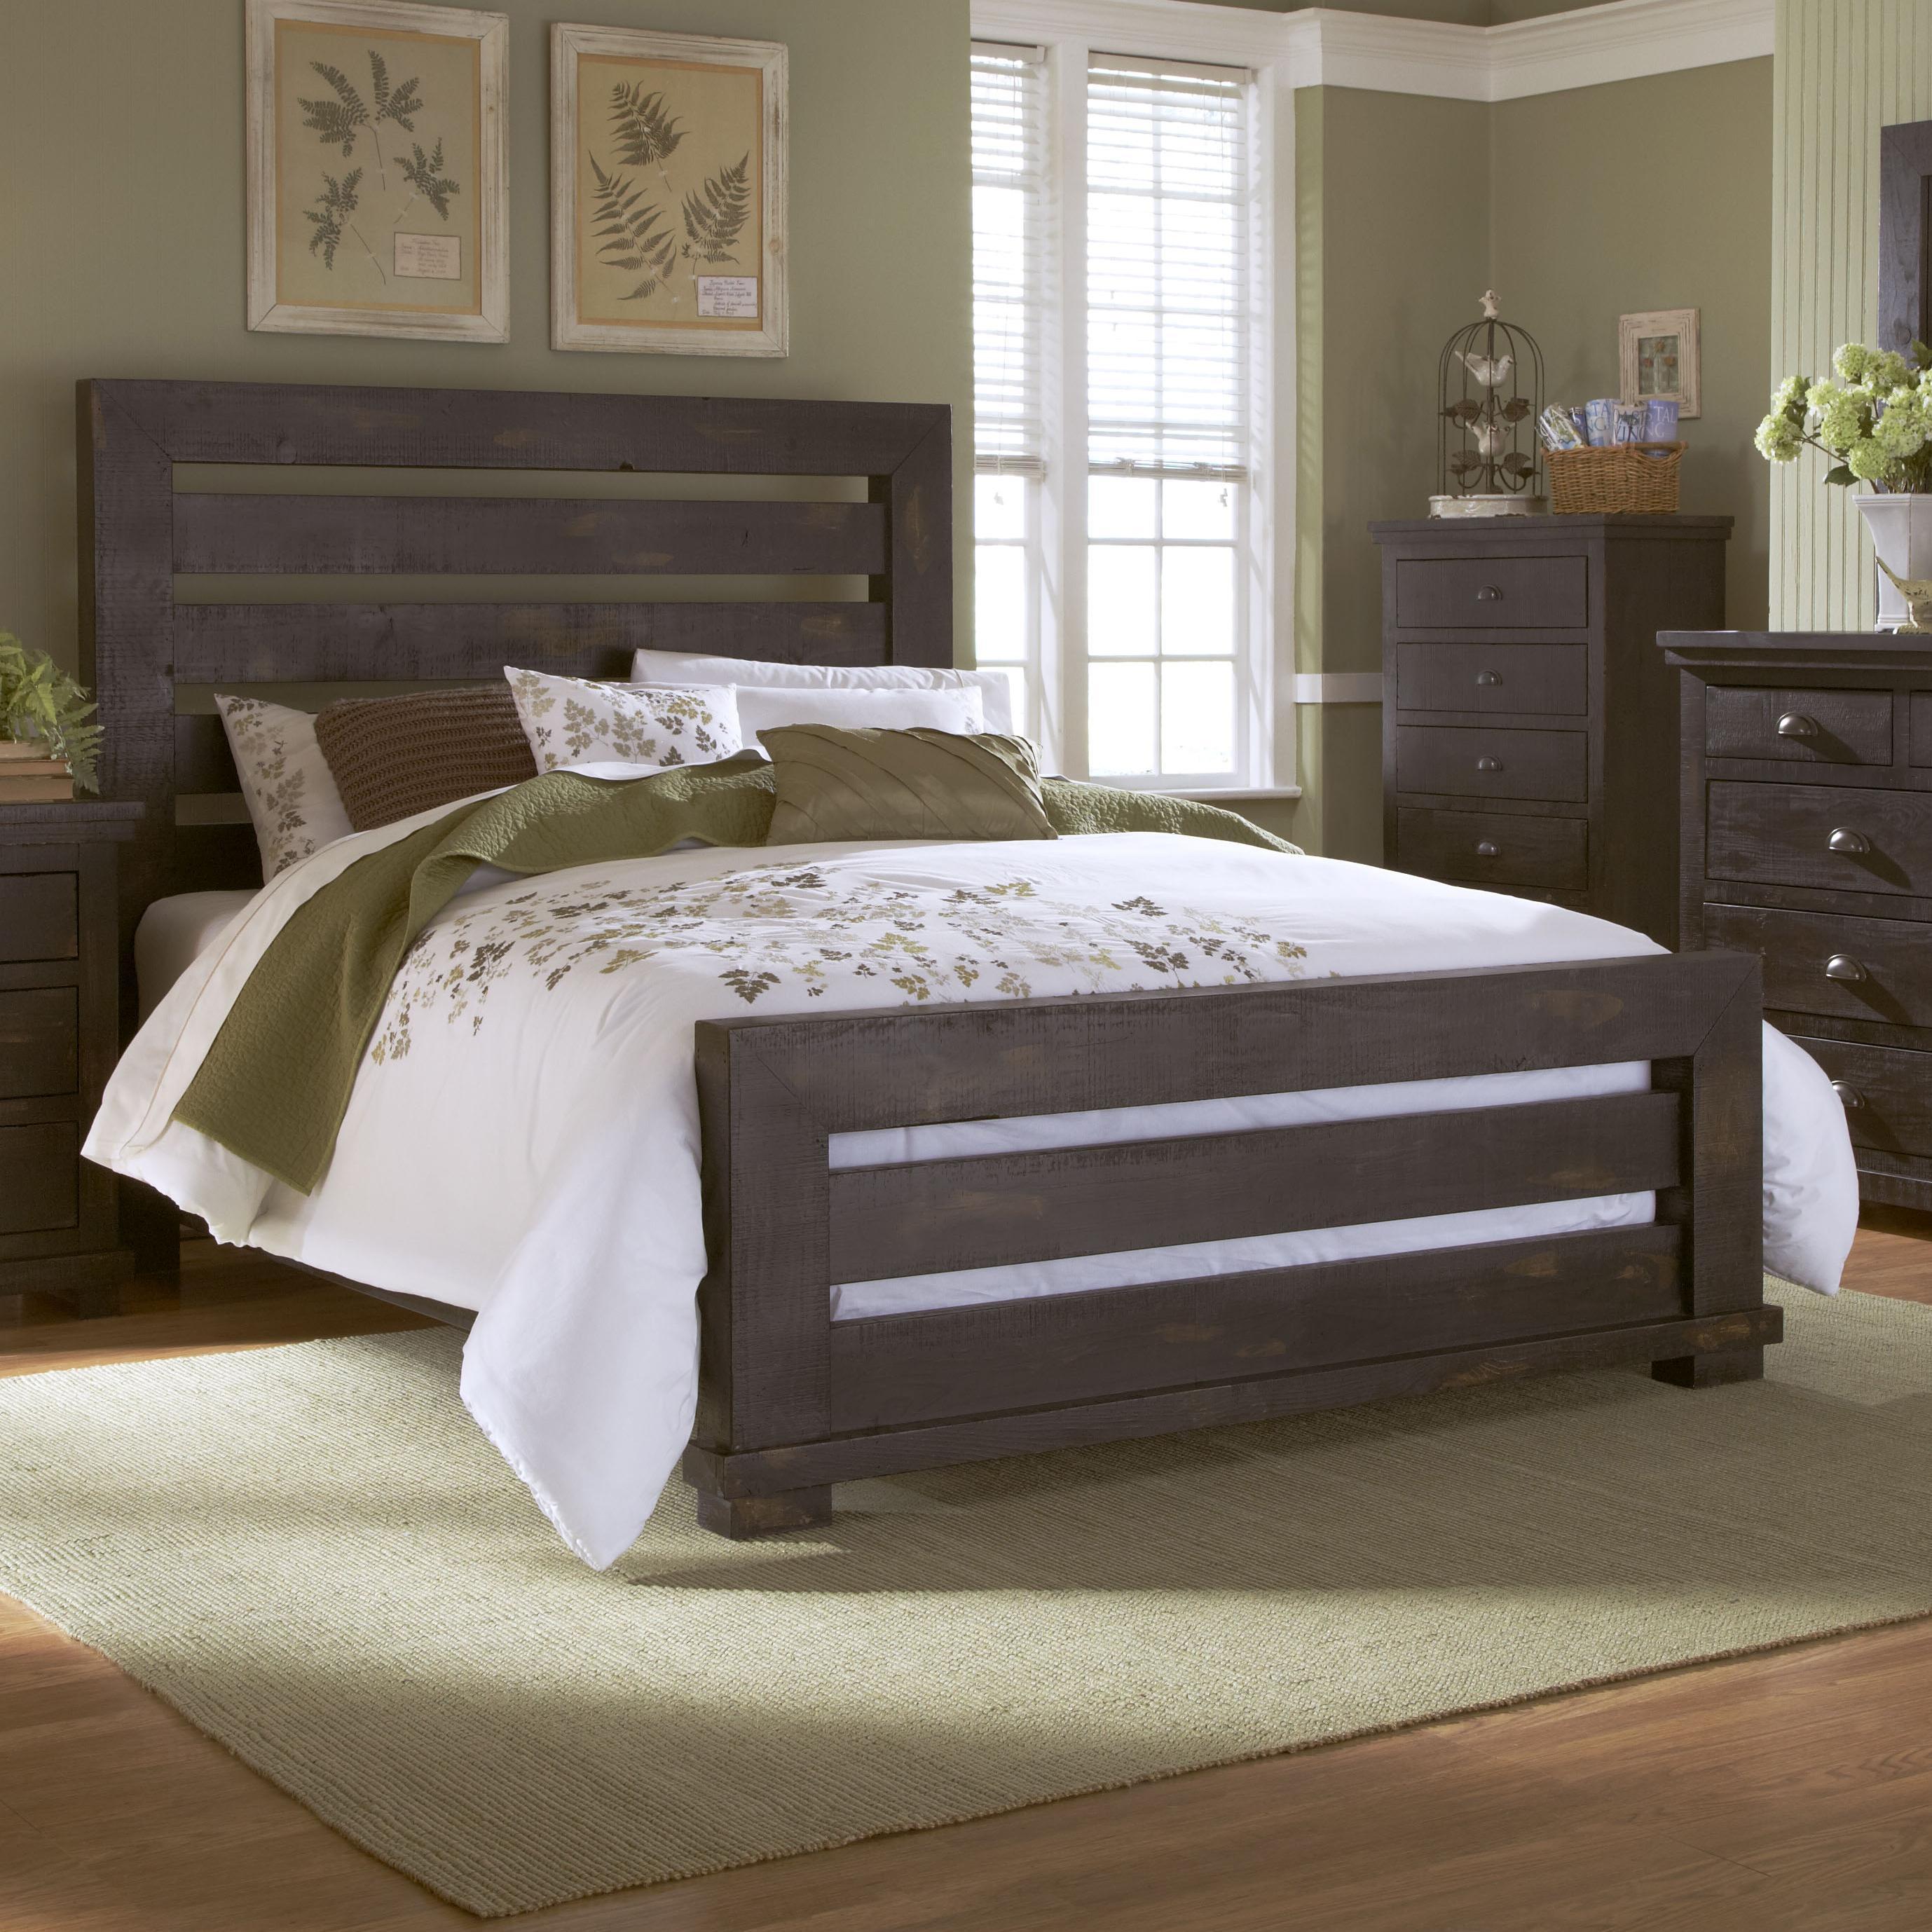 Progressive Furniture Willow King Slat Bed With Distressed Pine Frame    AHFA   Headboard U0026 Footboard Dealer Locator